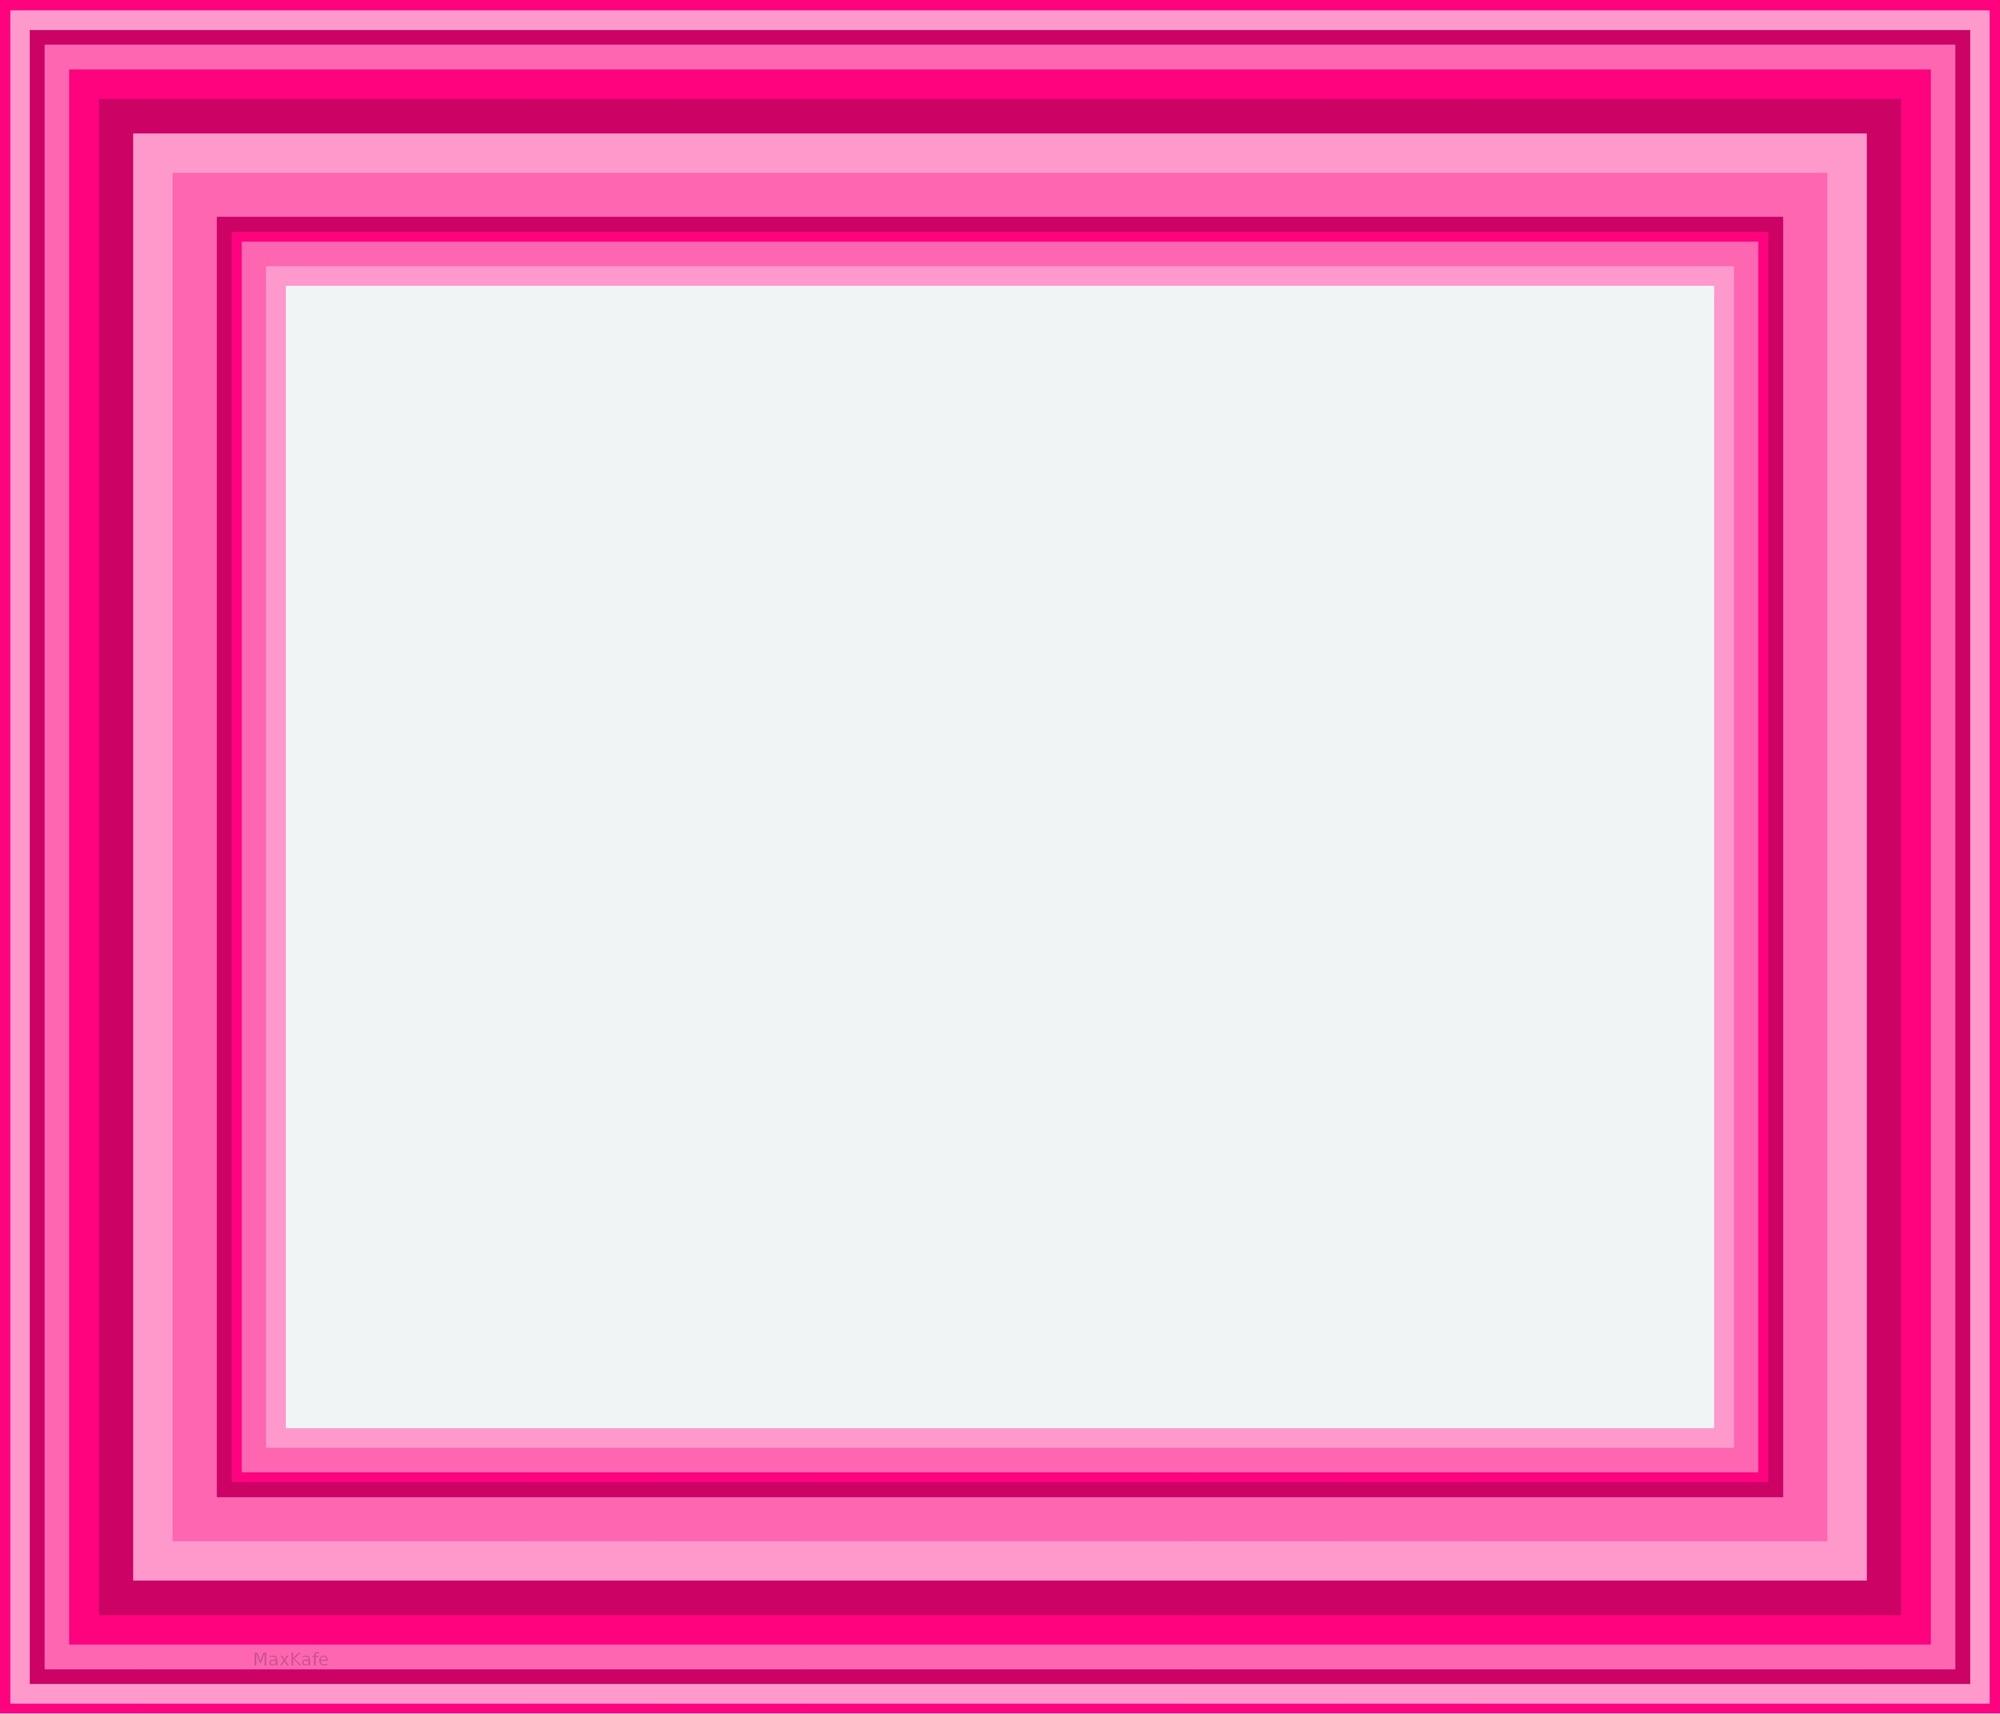 "MK16LFS130 Frame 6x7 Pink <a href=""https://dl.orangedox.com/xdJIvh"">[DOWNLOAD]</a>"